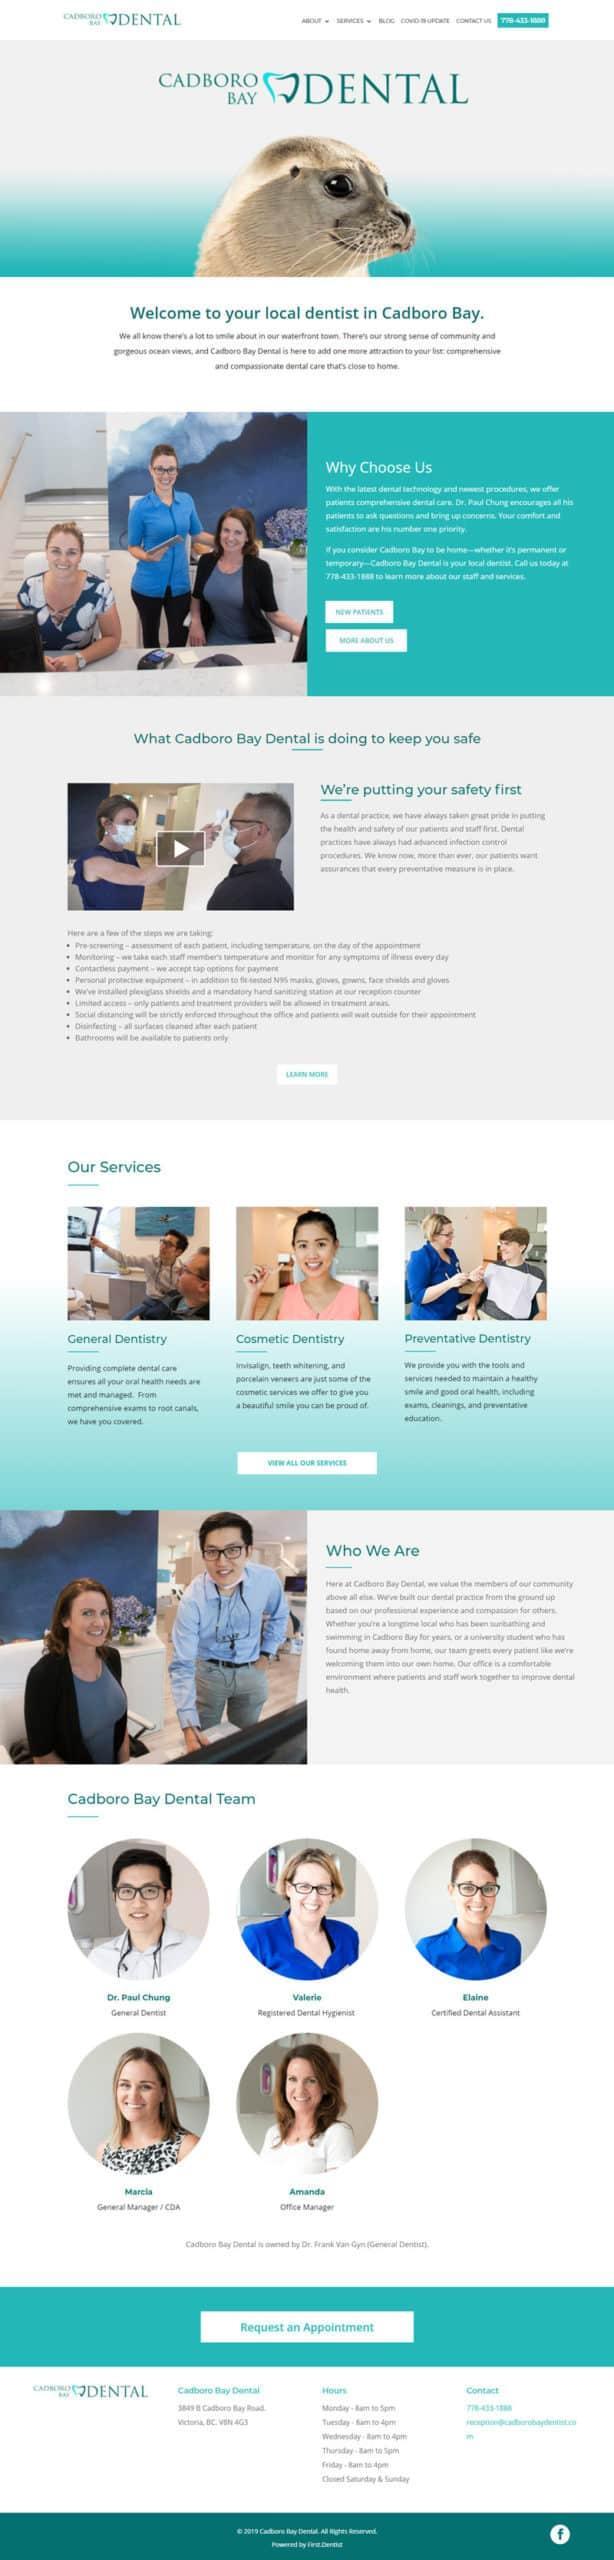 cadboro bay dental website homepage